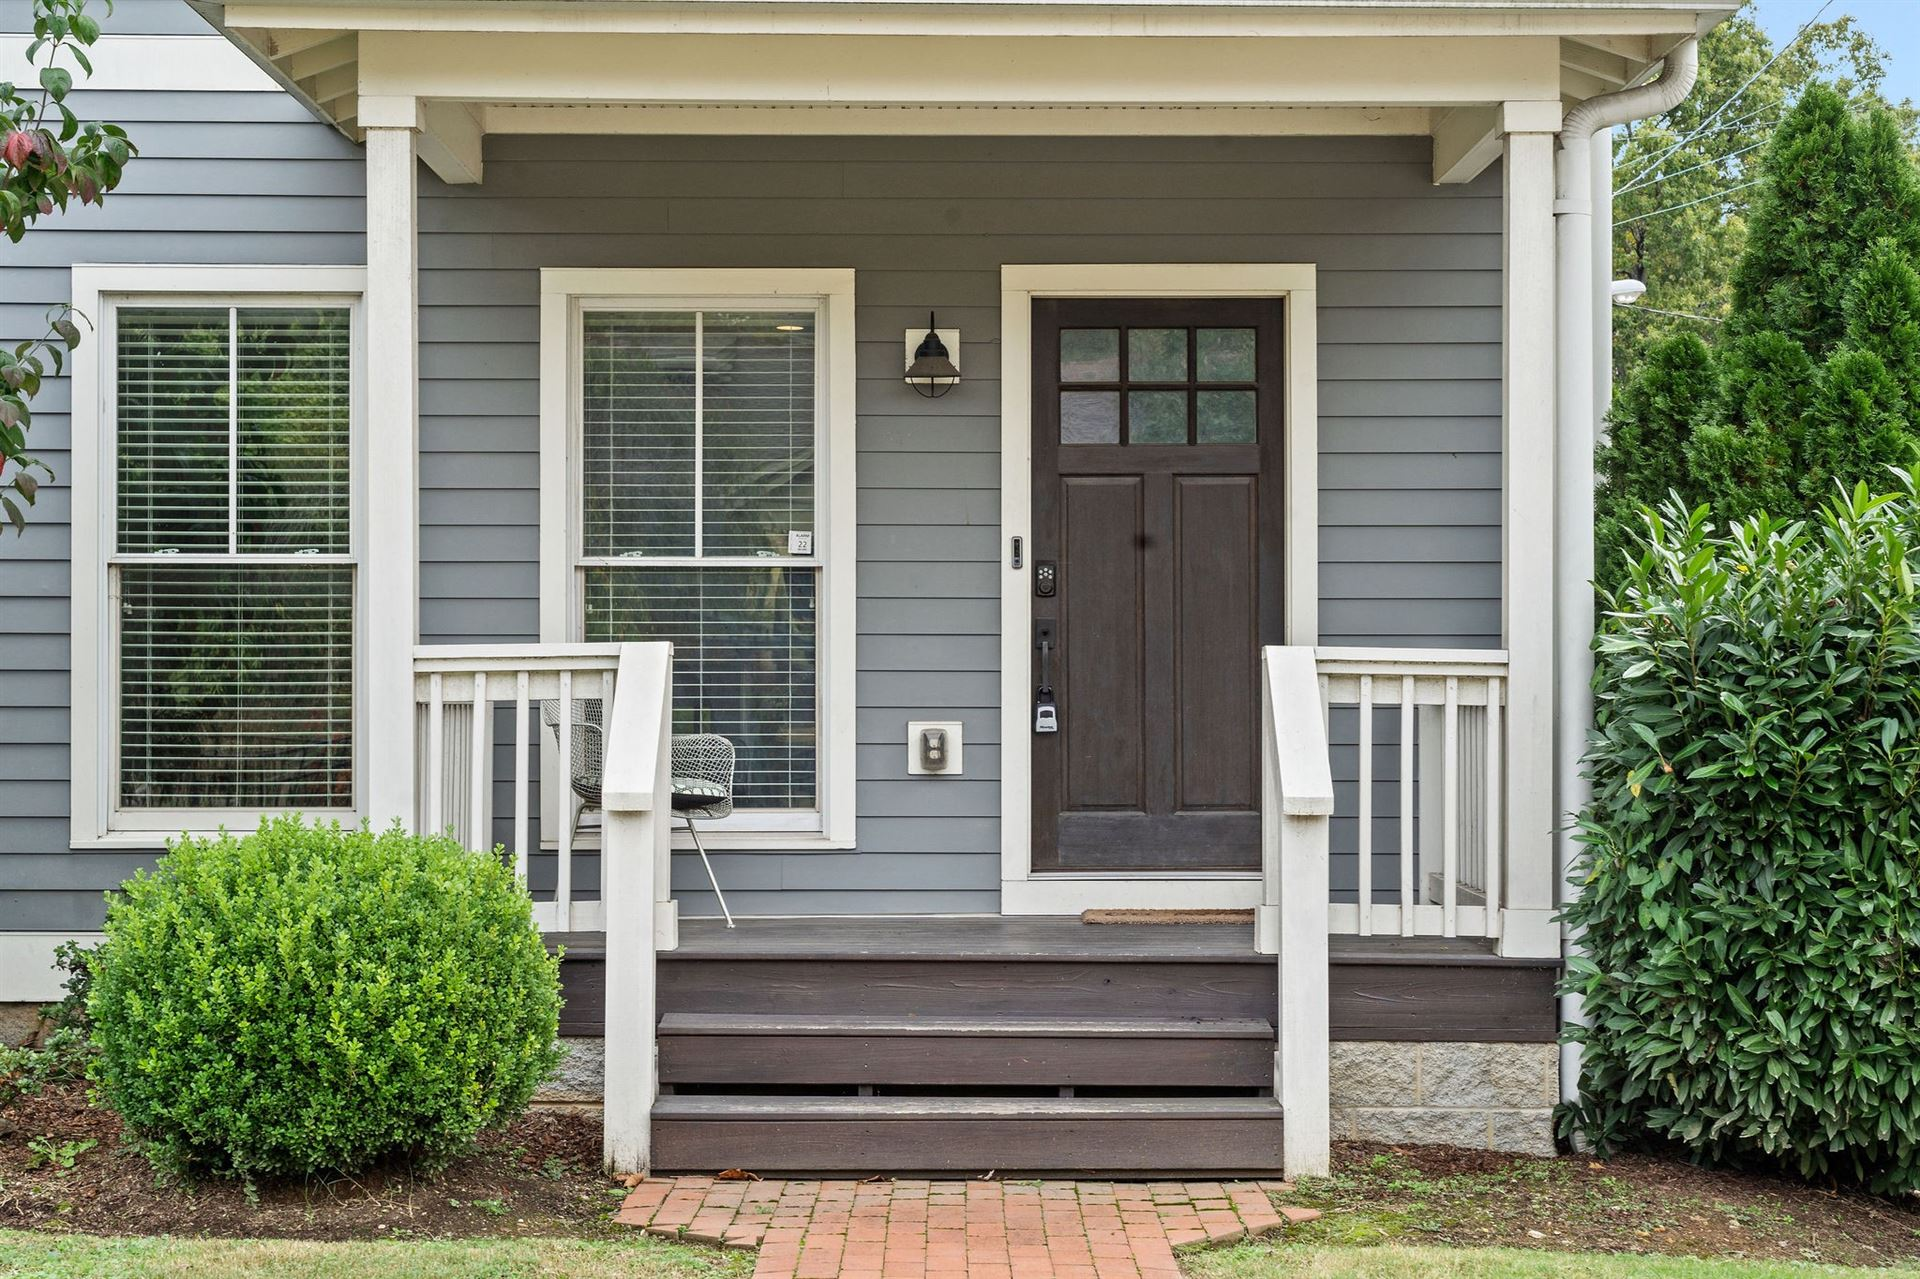 Photo of 600A Fatherland St, Nashville, TN 37206 (MLS # 2303552)